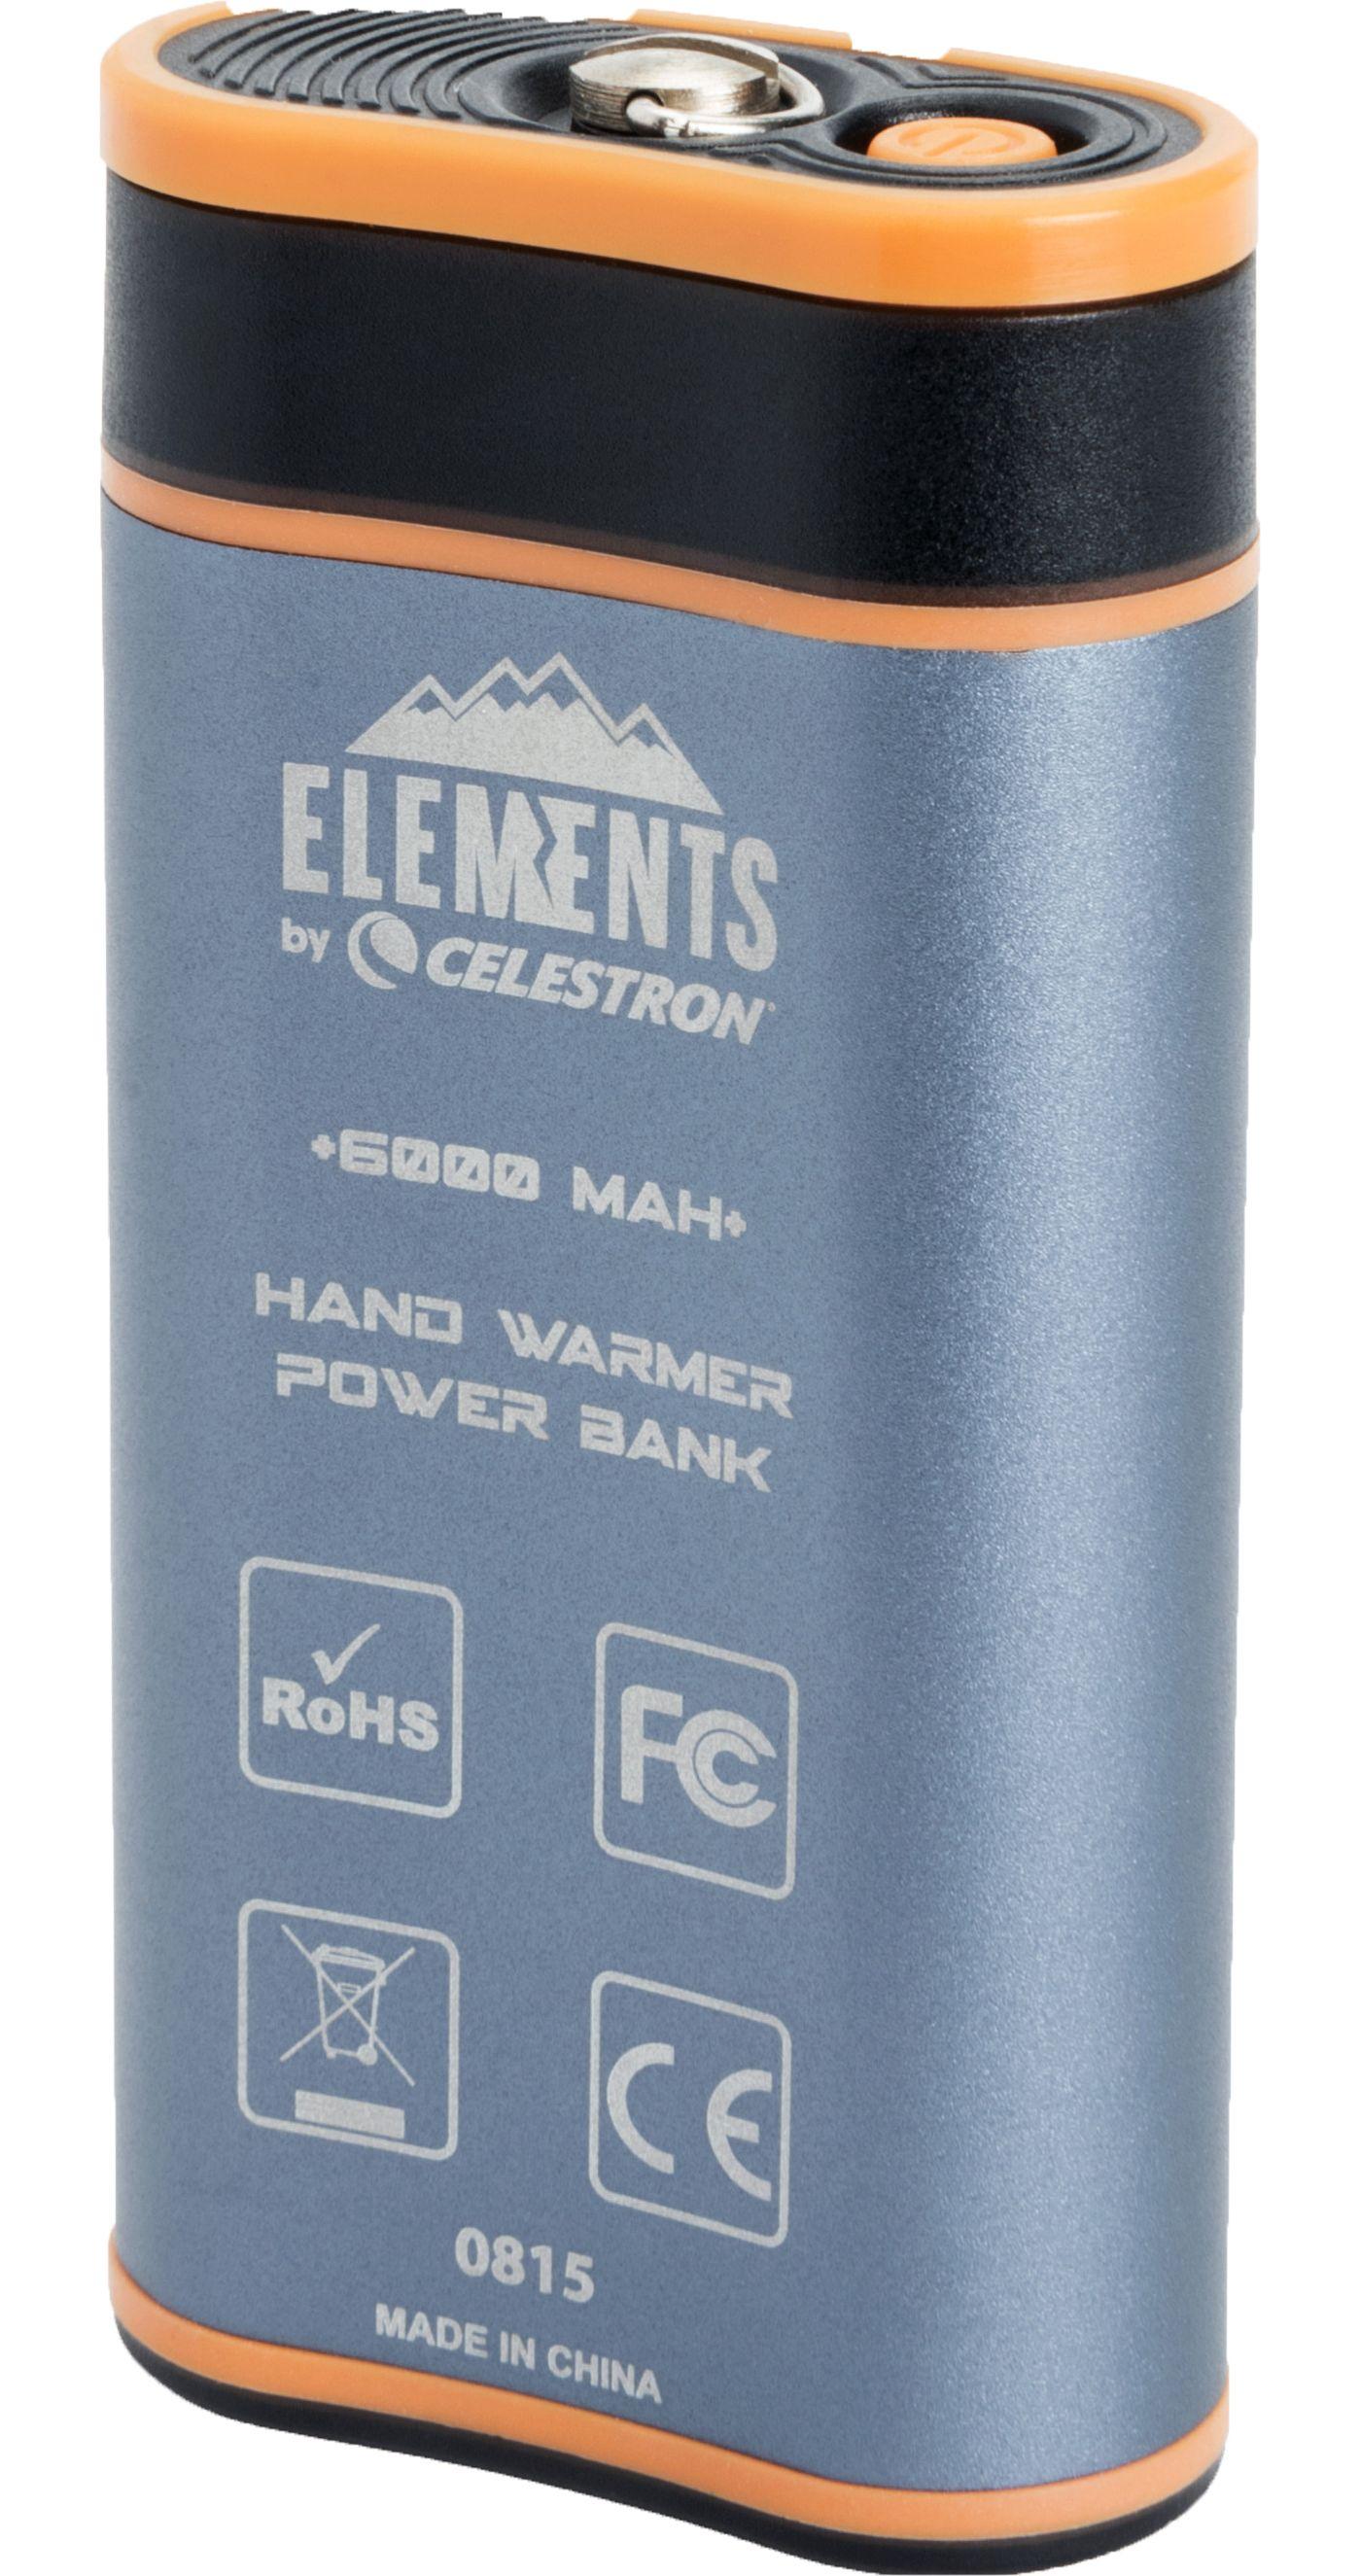 Celestron Elements Thermocharge 6